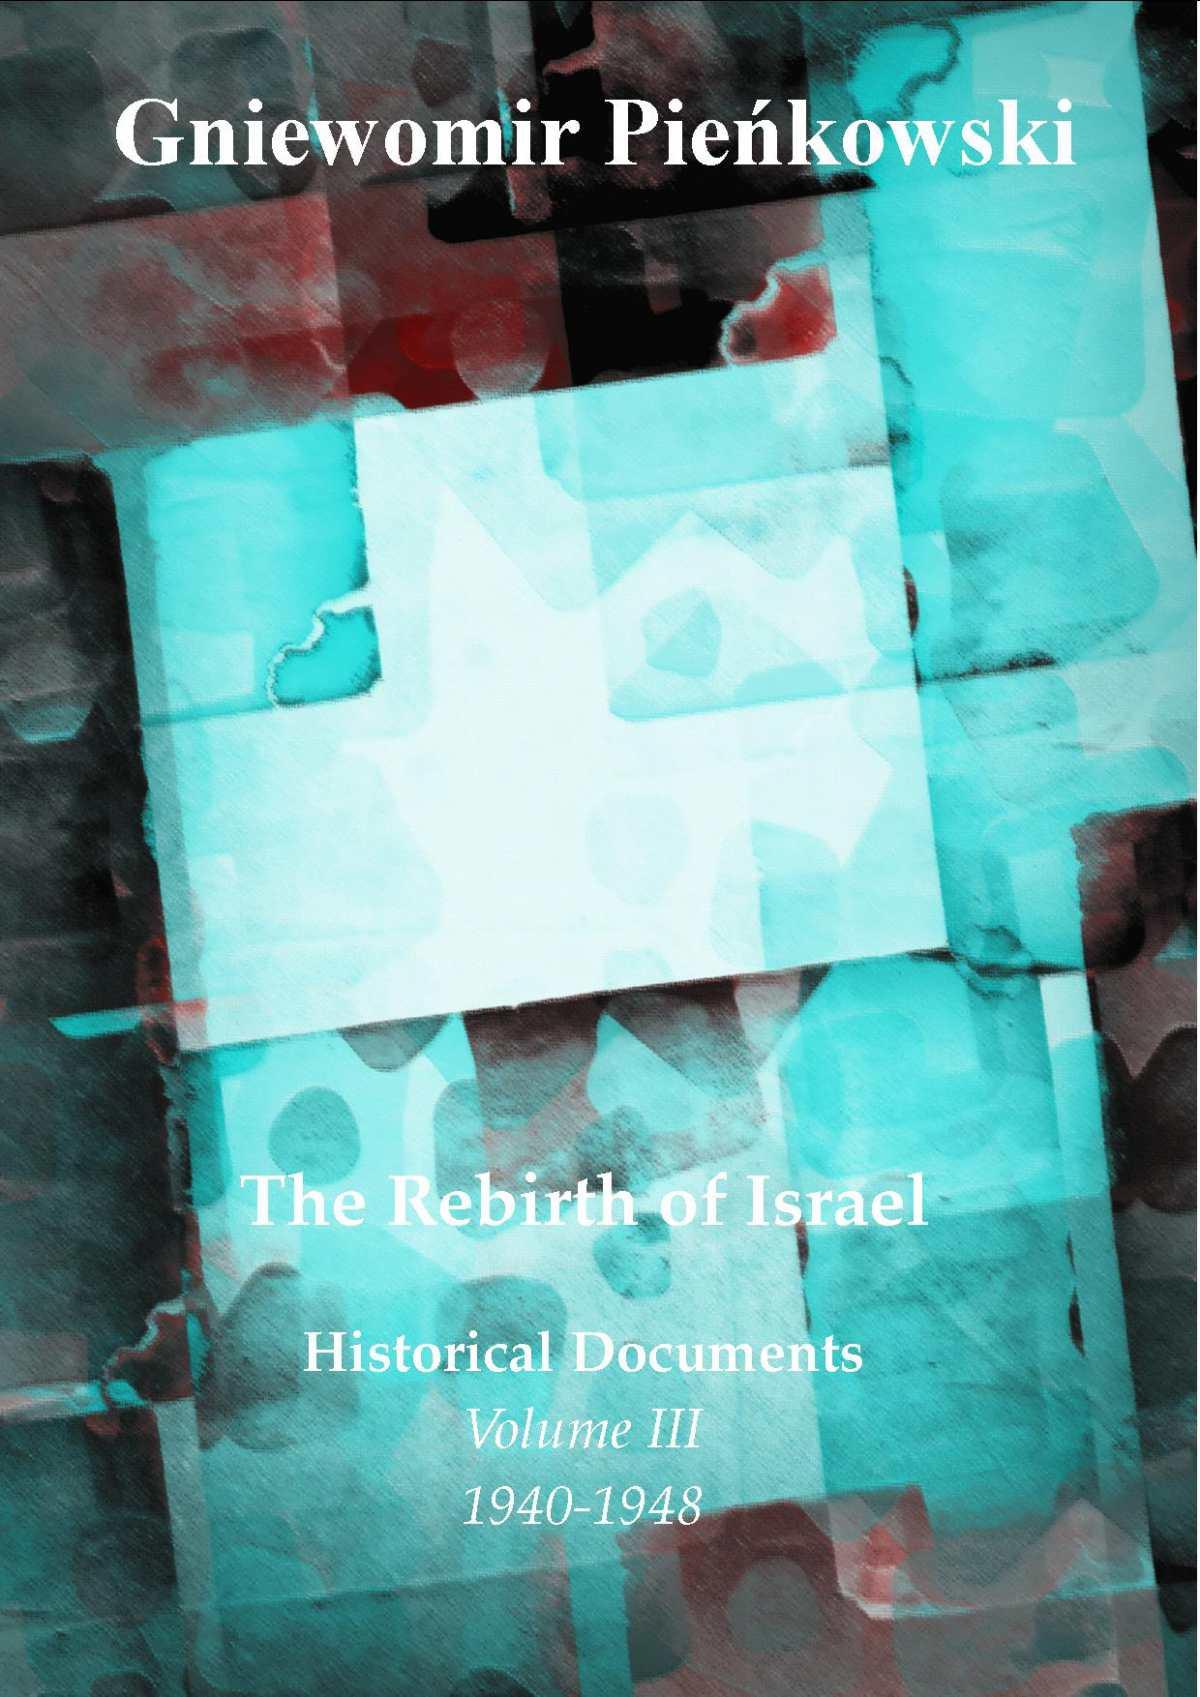 The Rebirth of Israel. Historical Documents. Volume III: 1940-1948. - Ebook (Książka PDF) do pobrania w formacie PDF